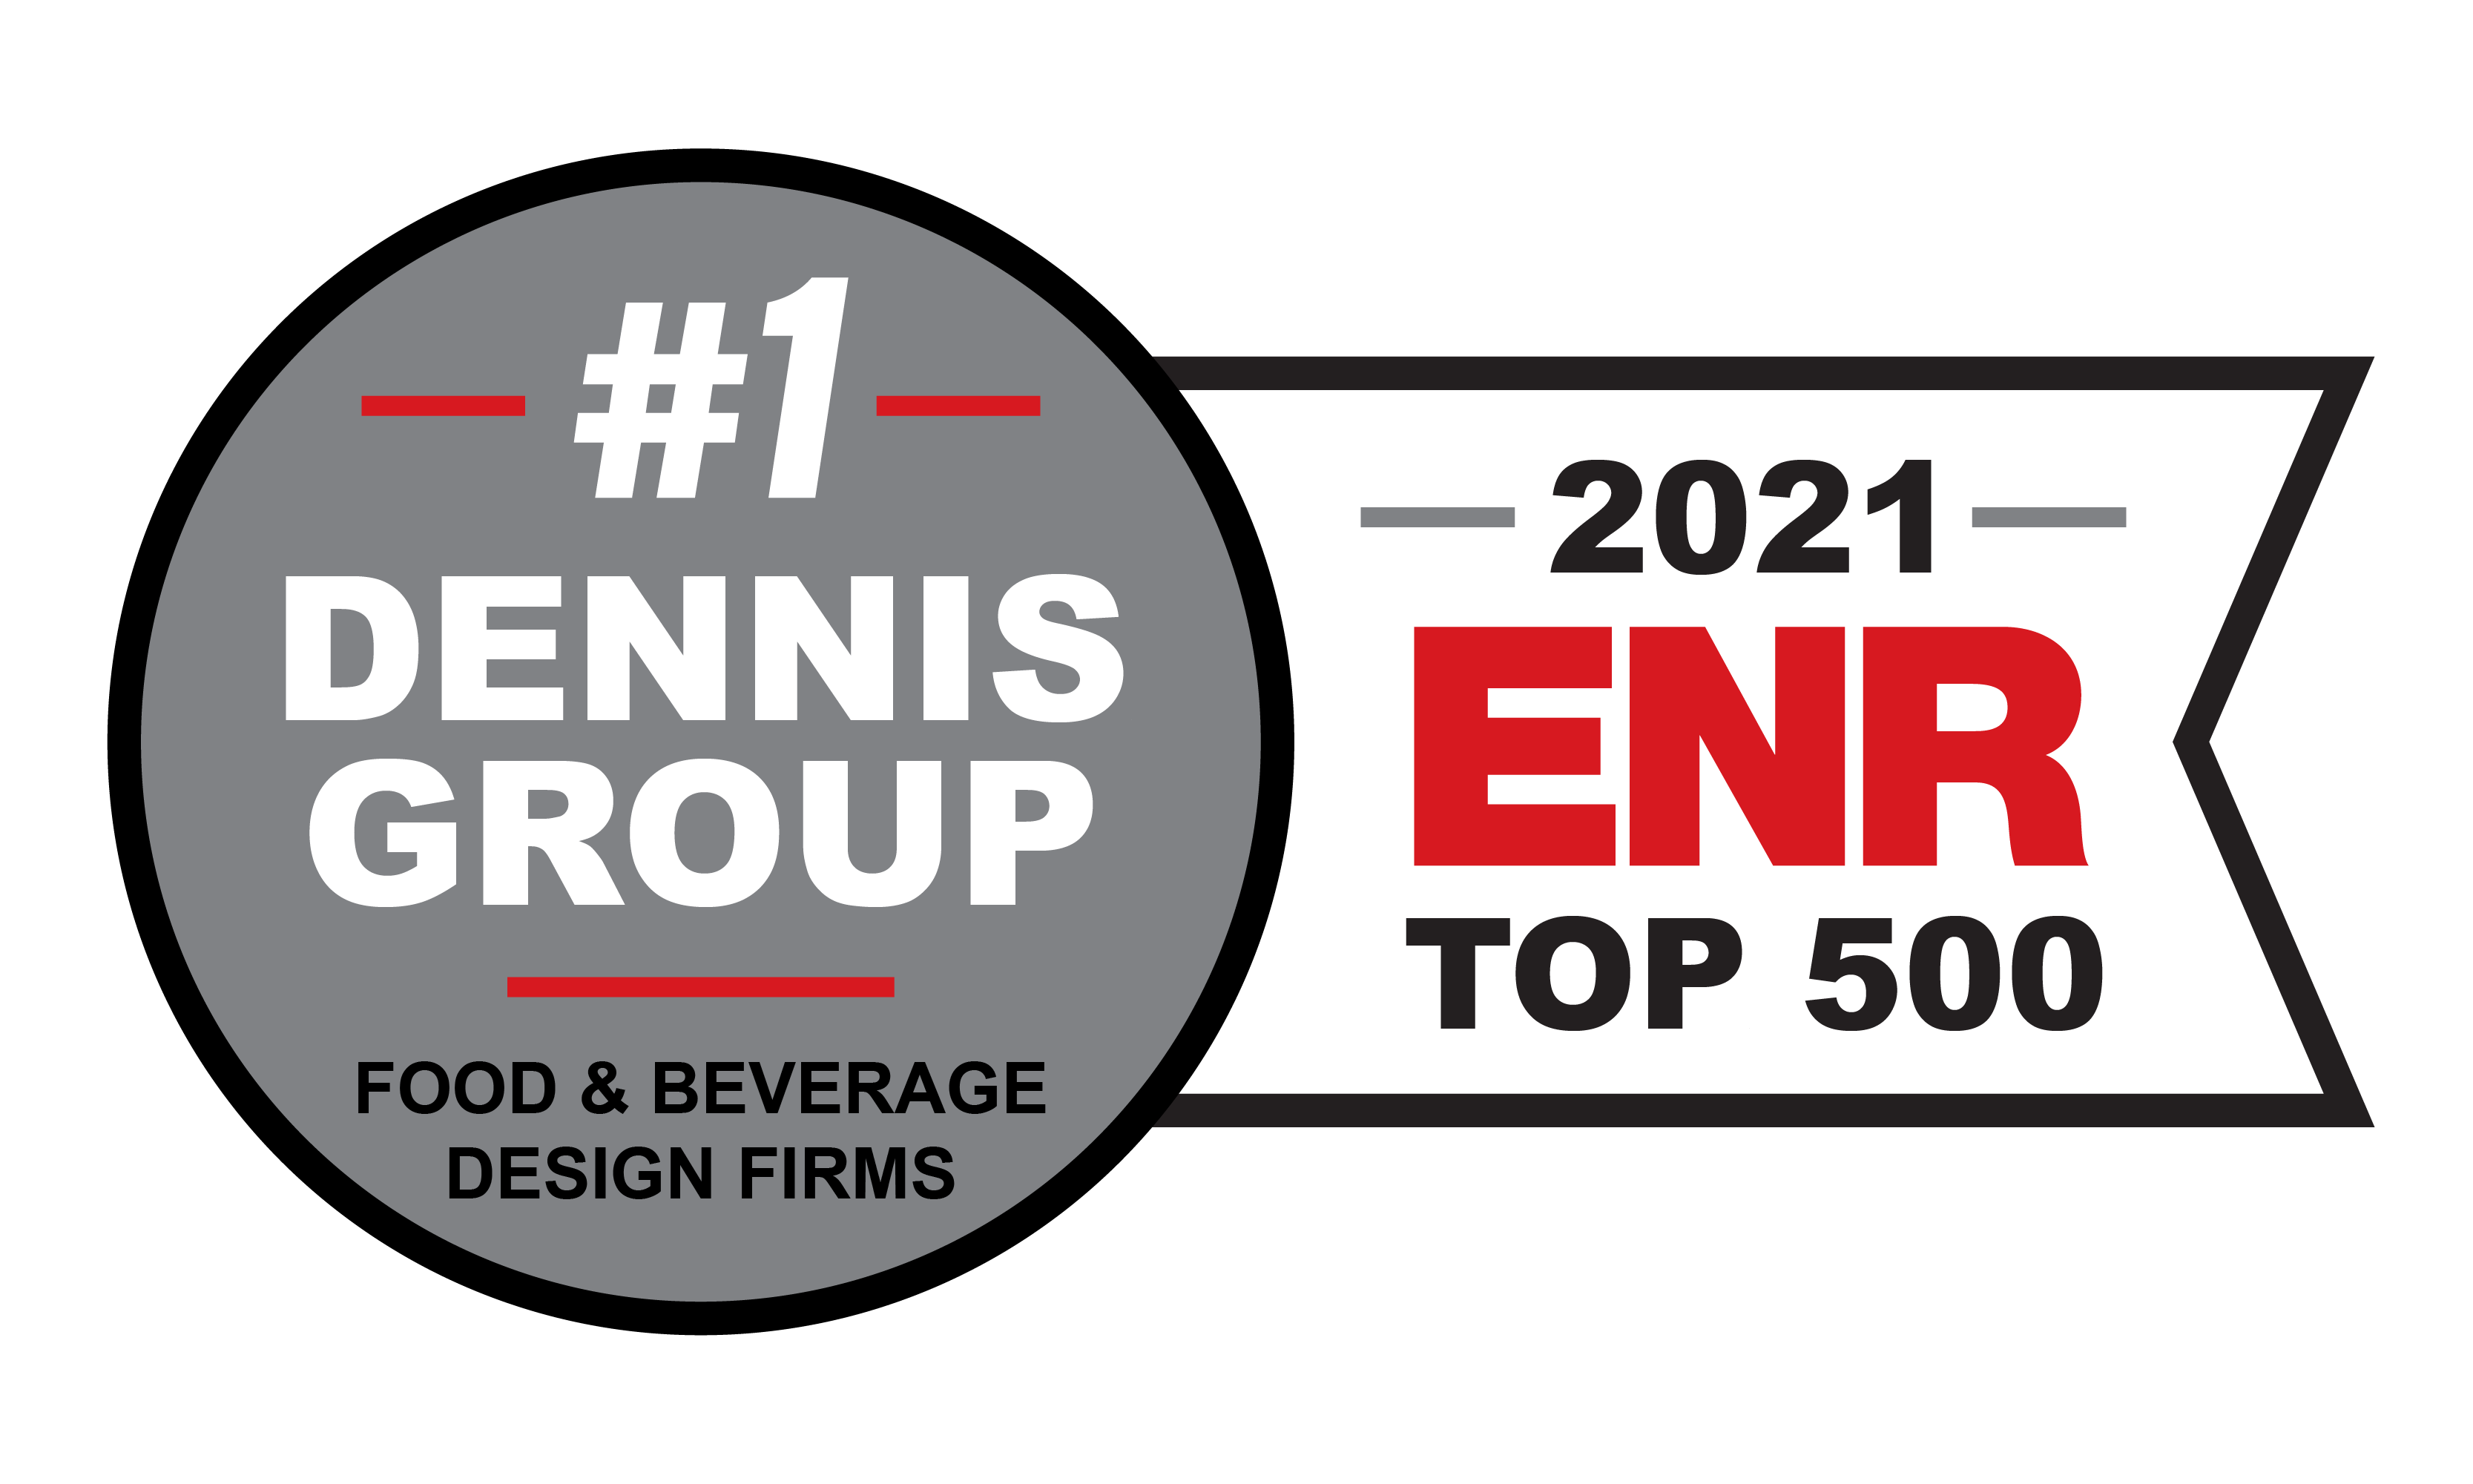 ENR_Top500_DGversion_003_Solid-02